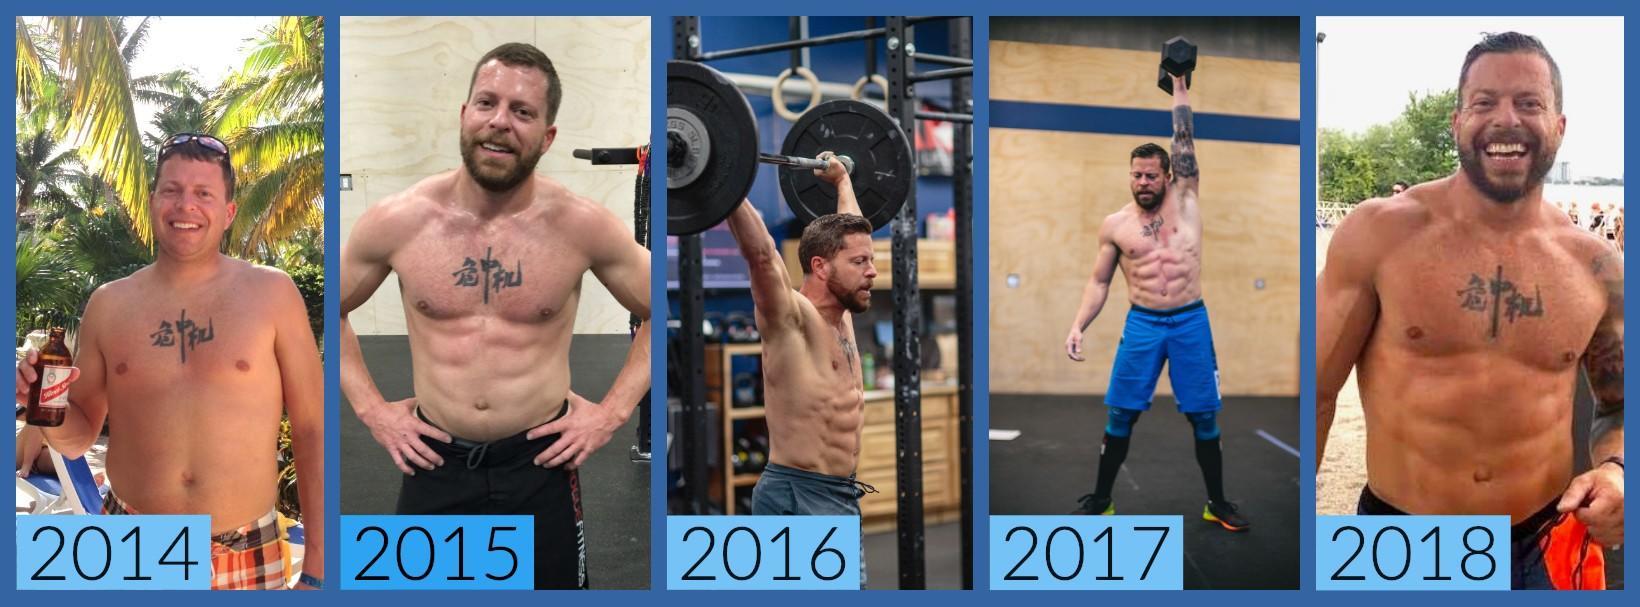 Progress of Fitness Jason Grubb